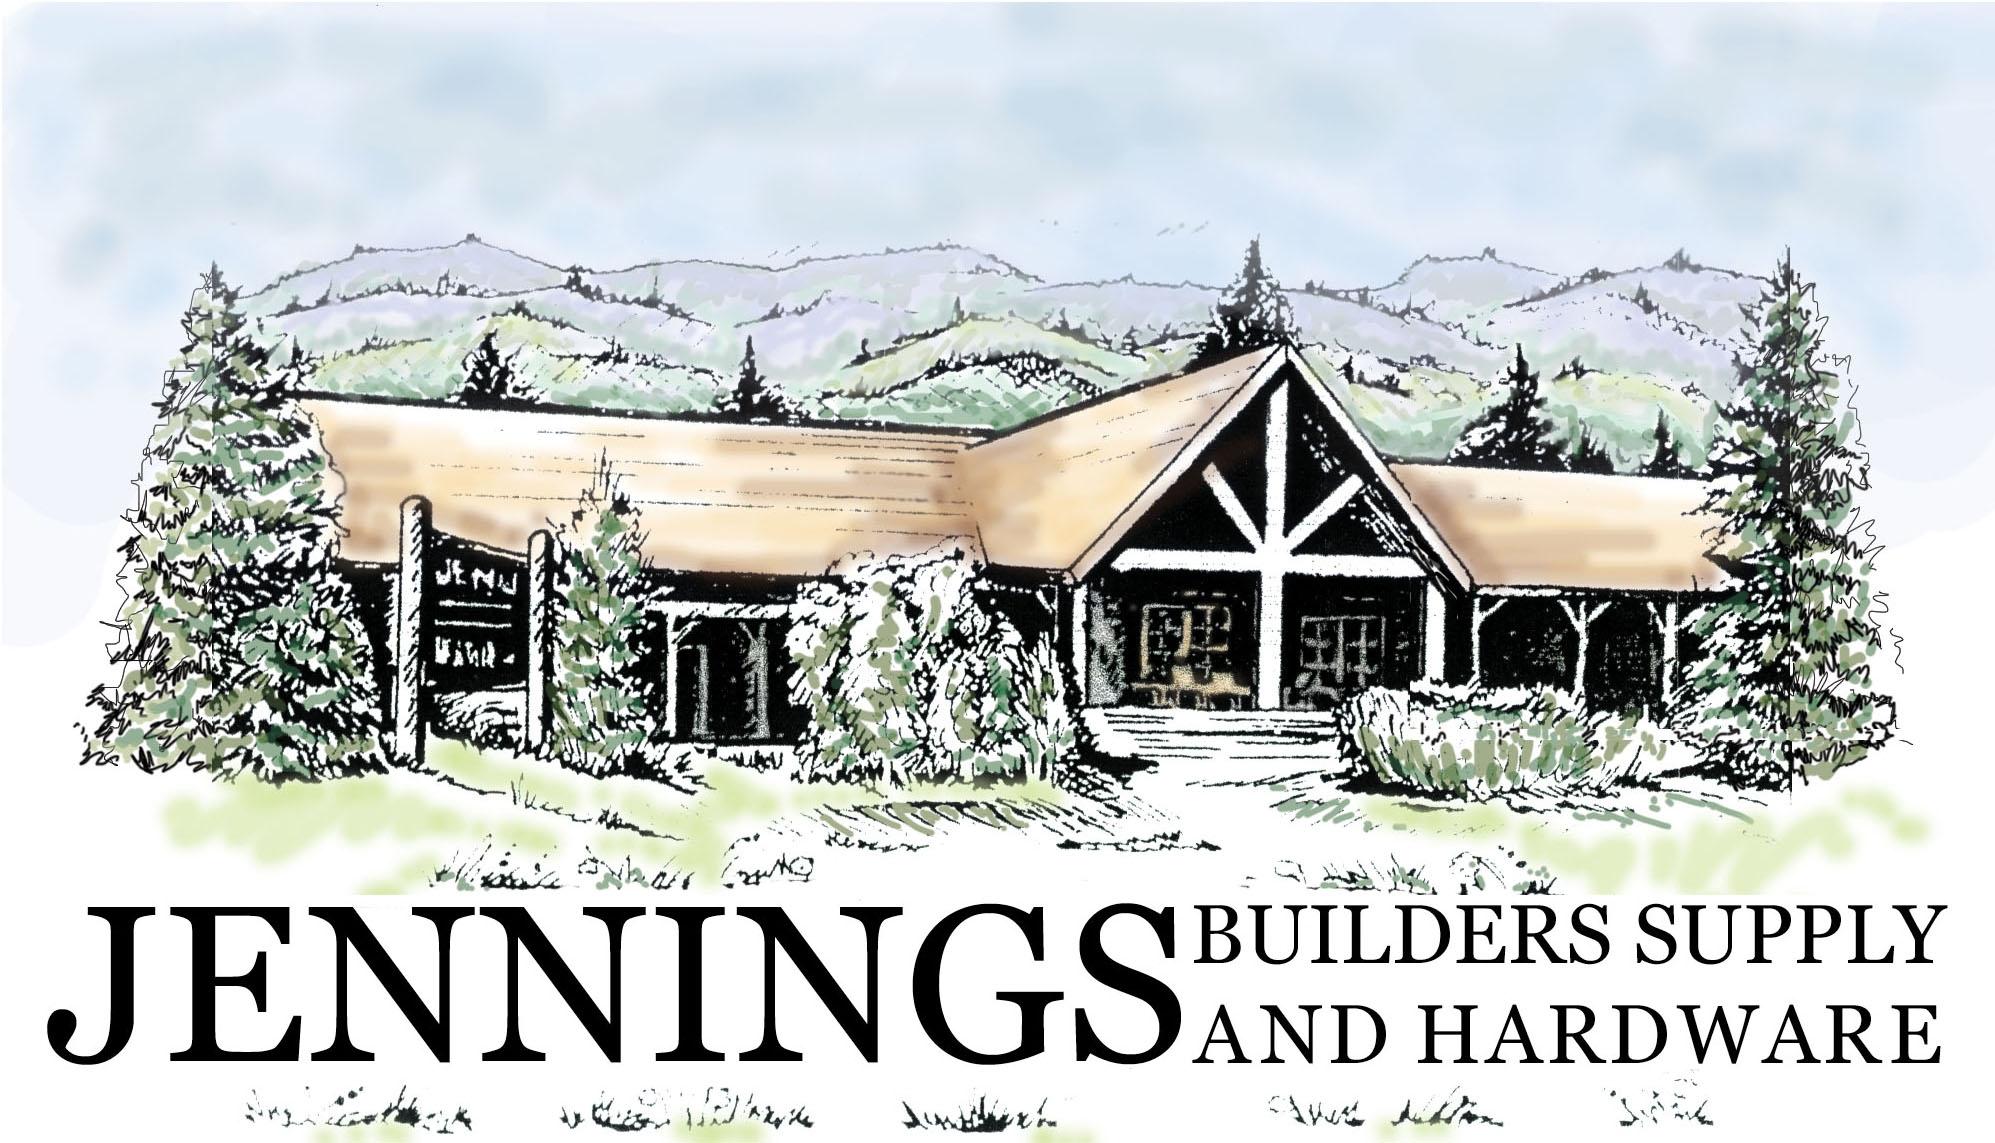 Jennings Builders Supply Amp Hardware Prosales Online